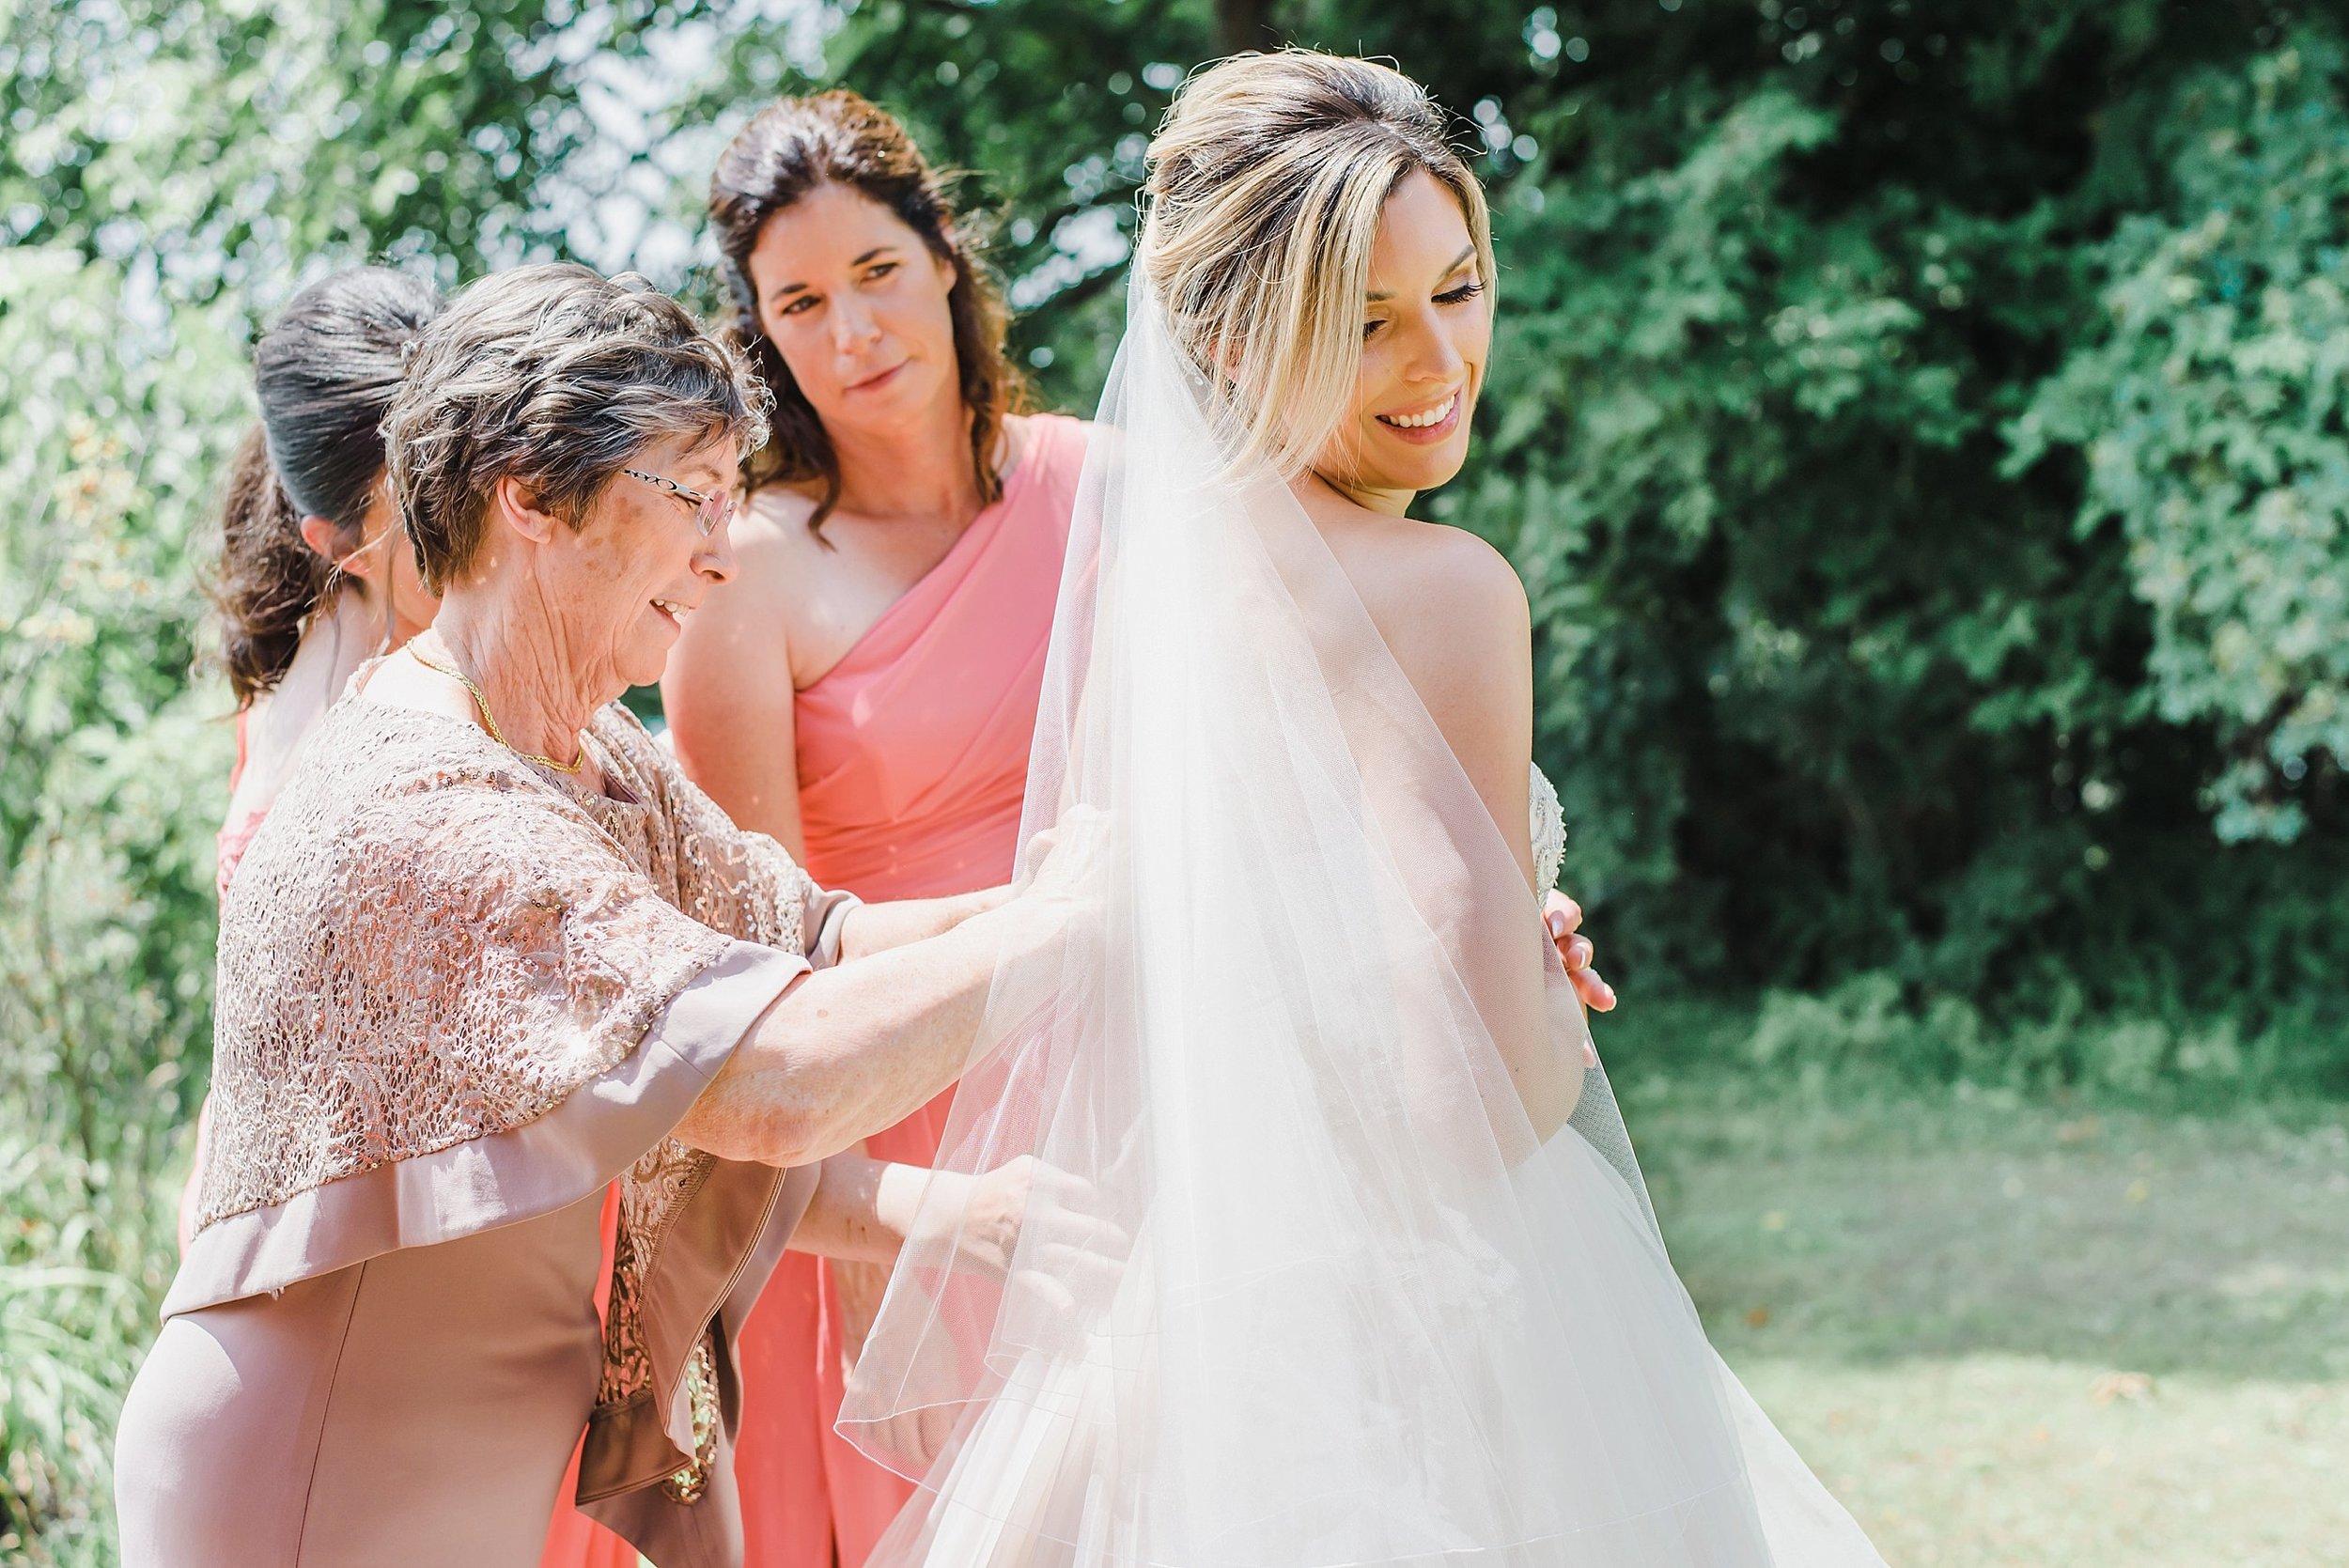 light airy indie fine art ottawa wedding photographer | Ali and Batoul Photography_0139.jpg